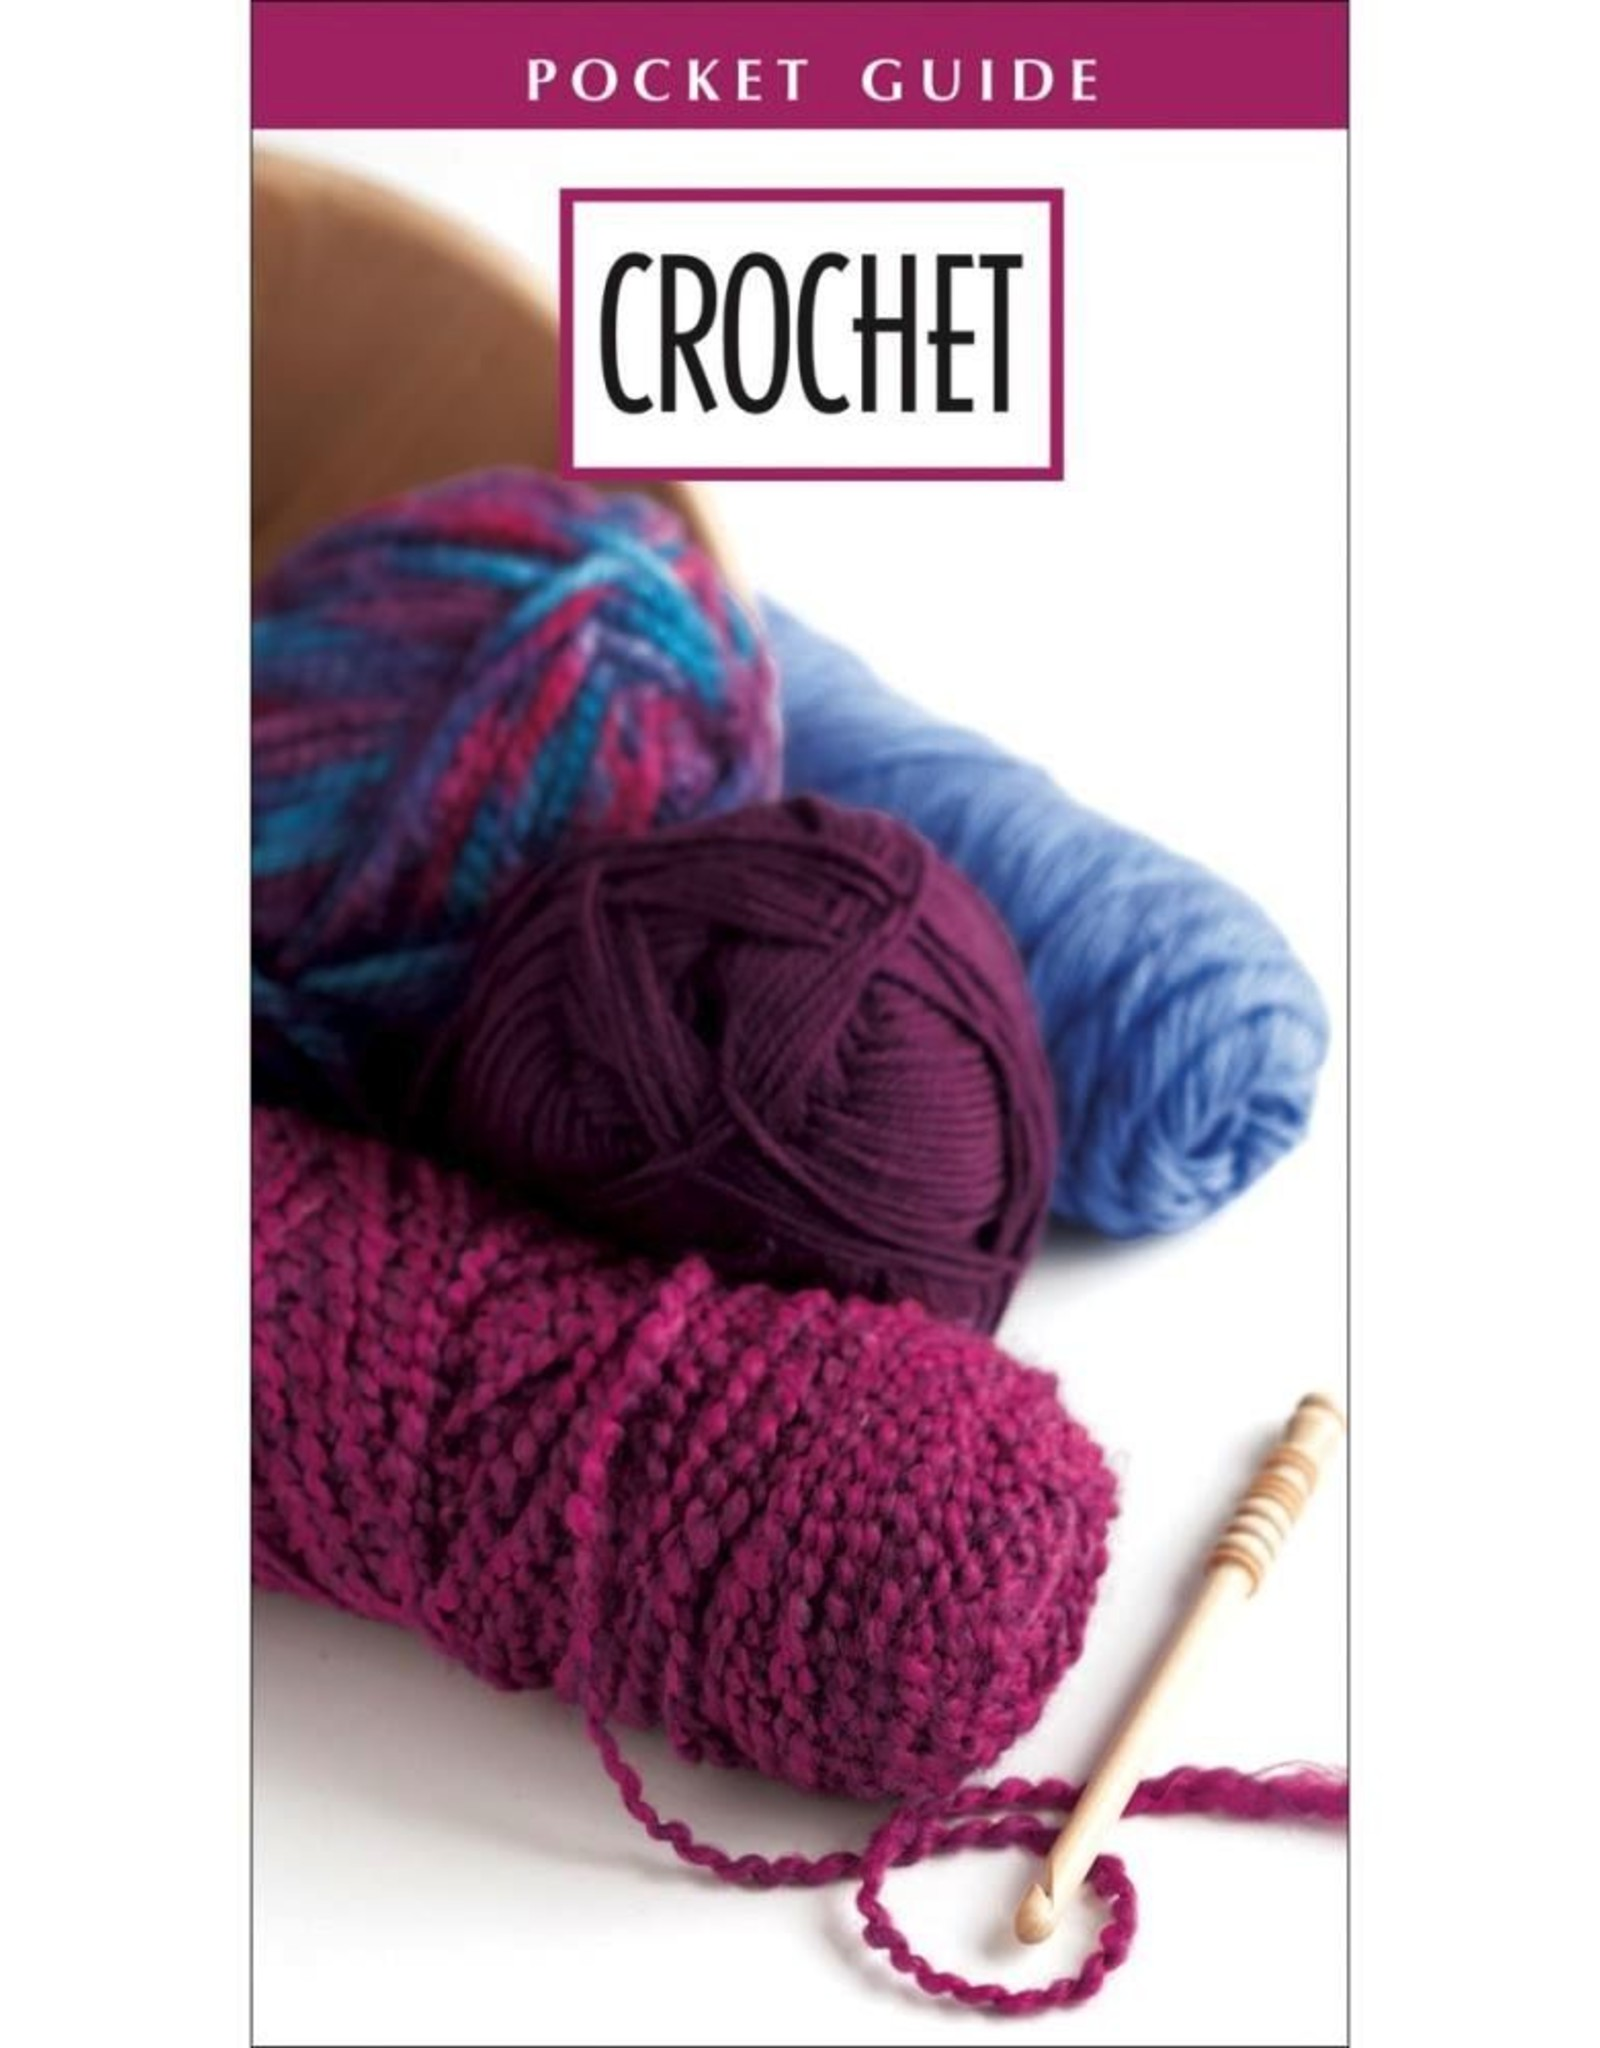 Leisure Arts Leisure Arts - Crochet Pocket Guide